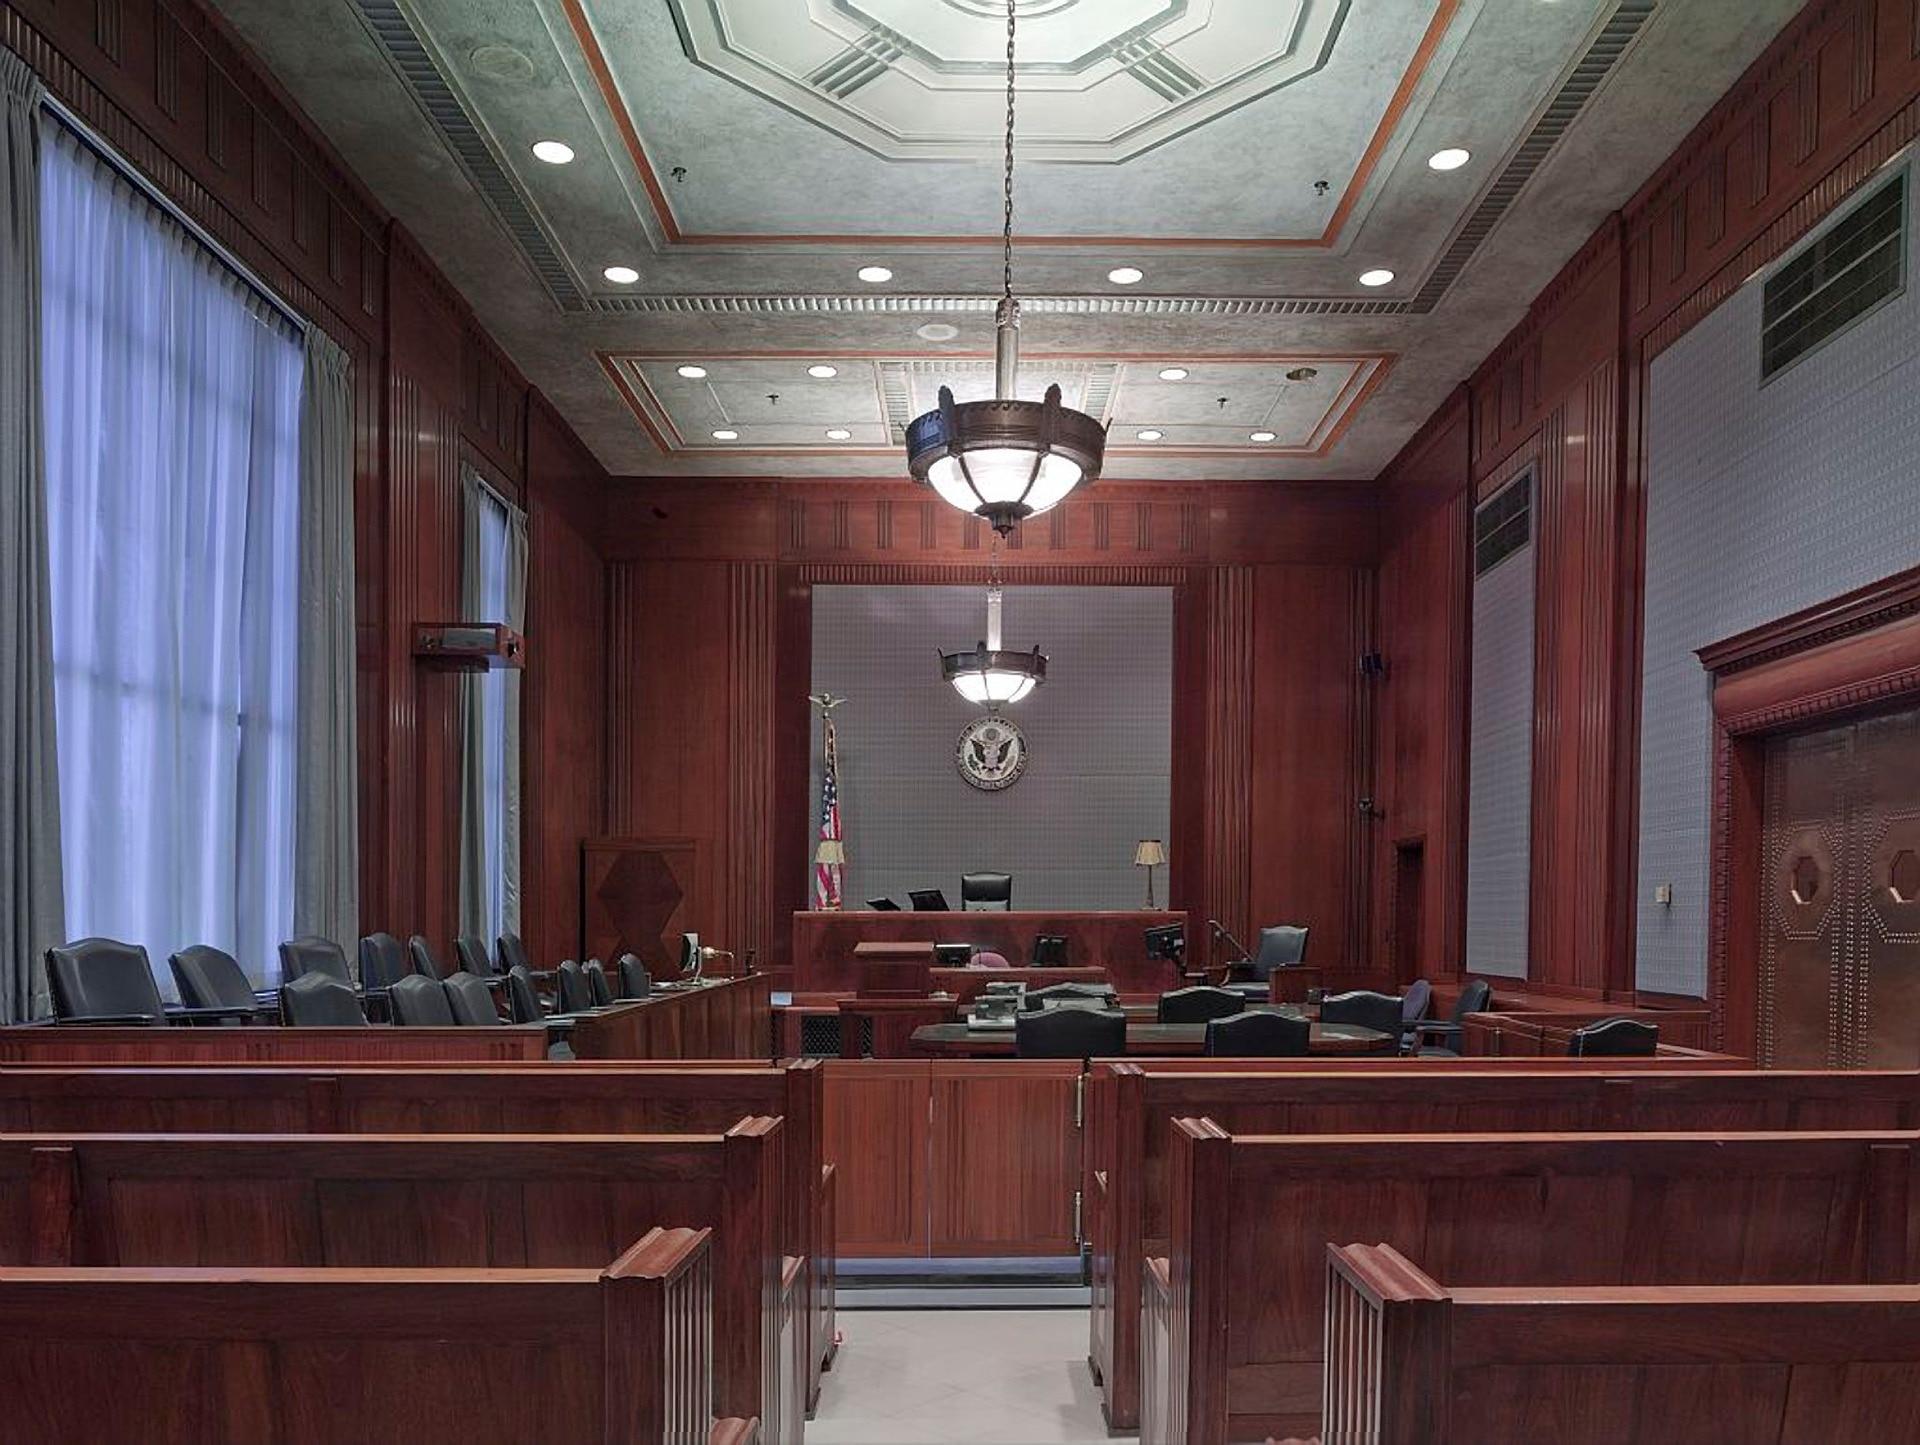 Interior of Court Room